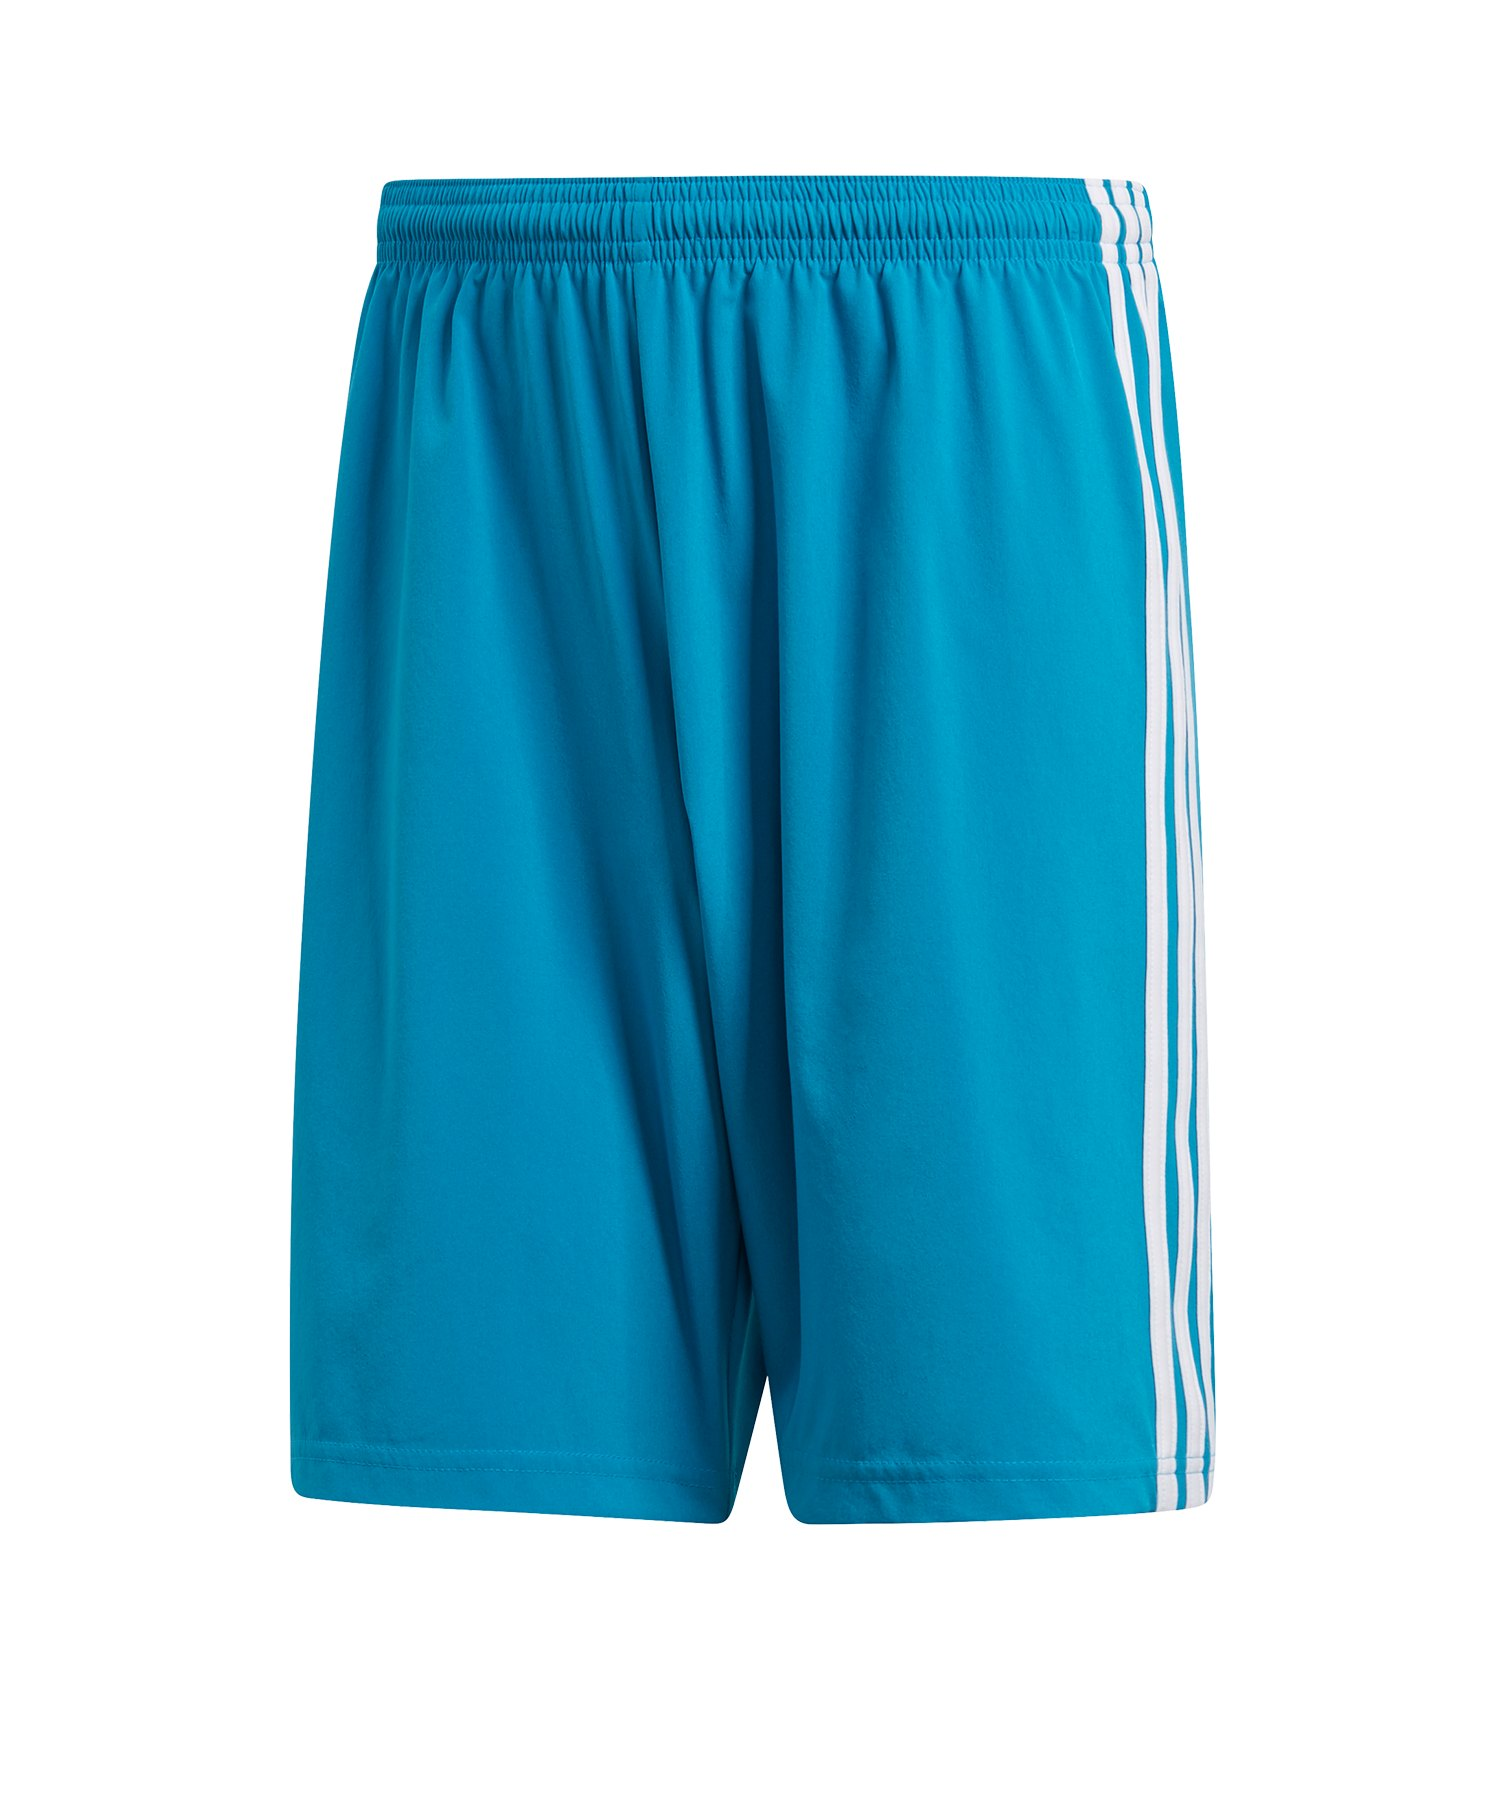 adidas Condivo 18 Short Blau Weiss - blau